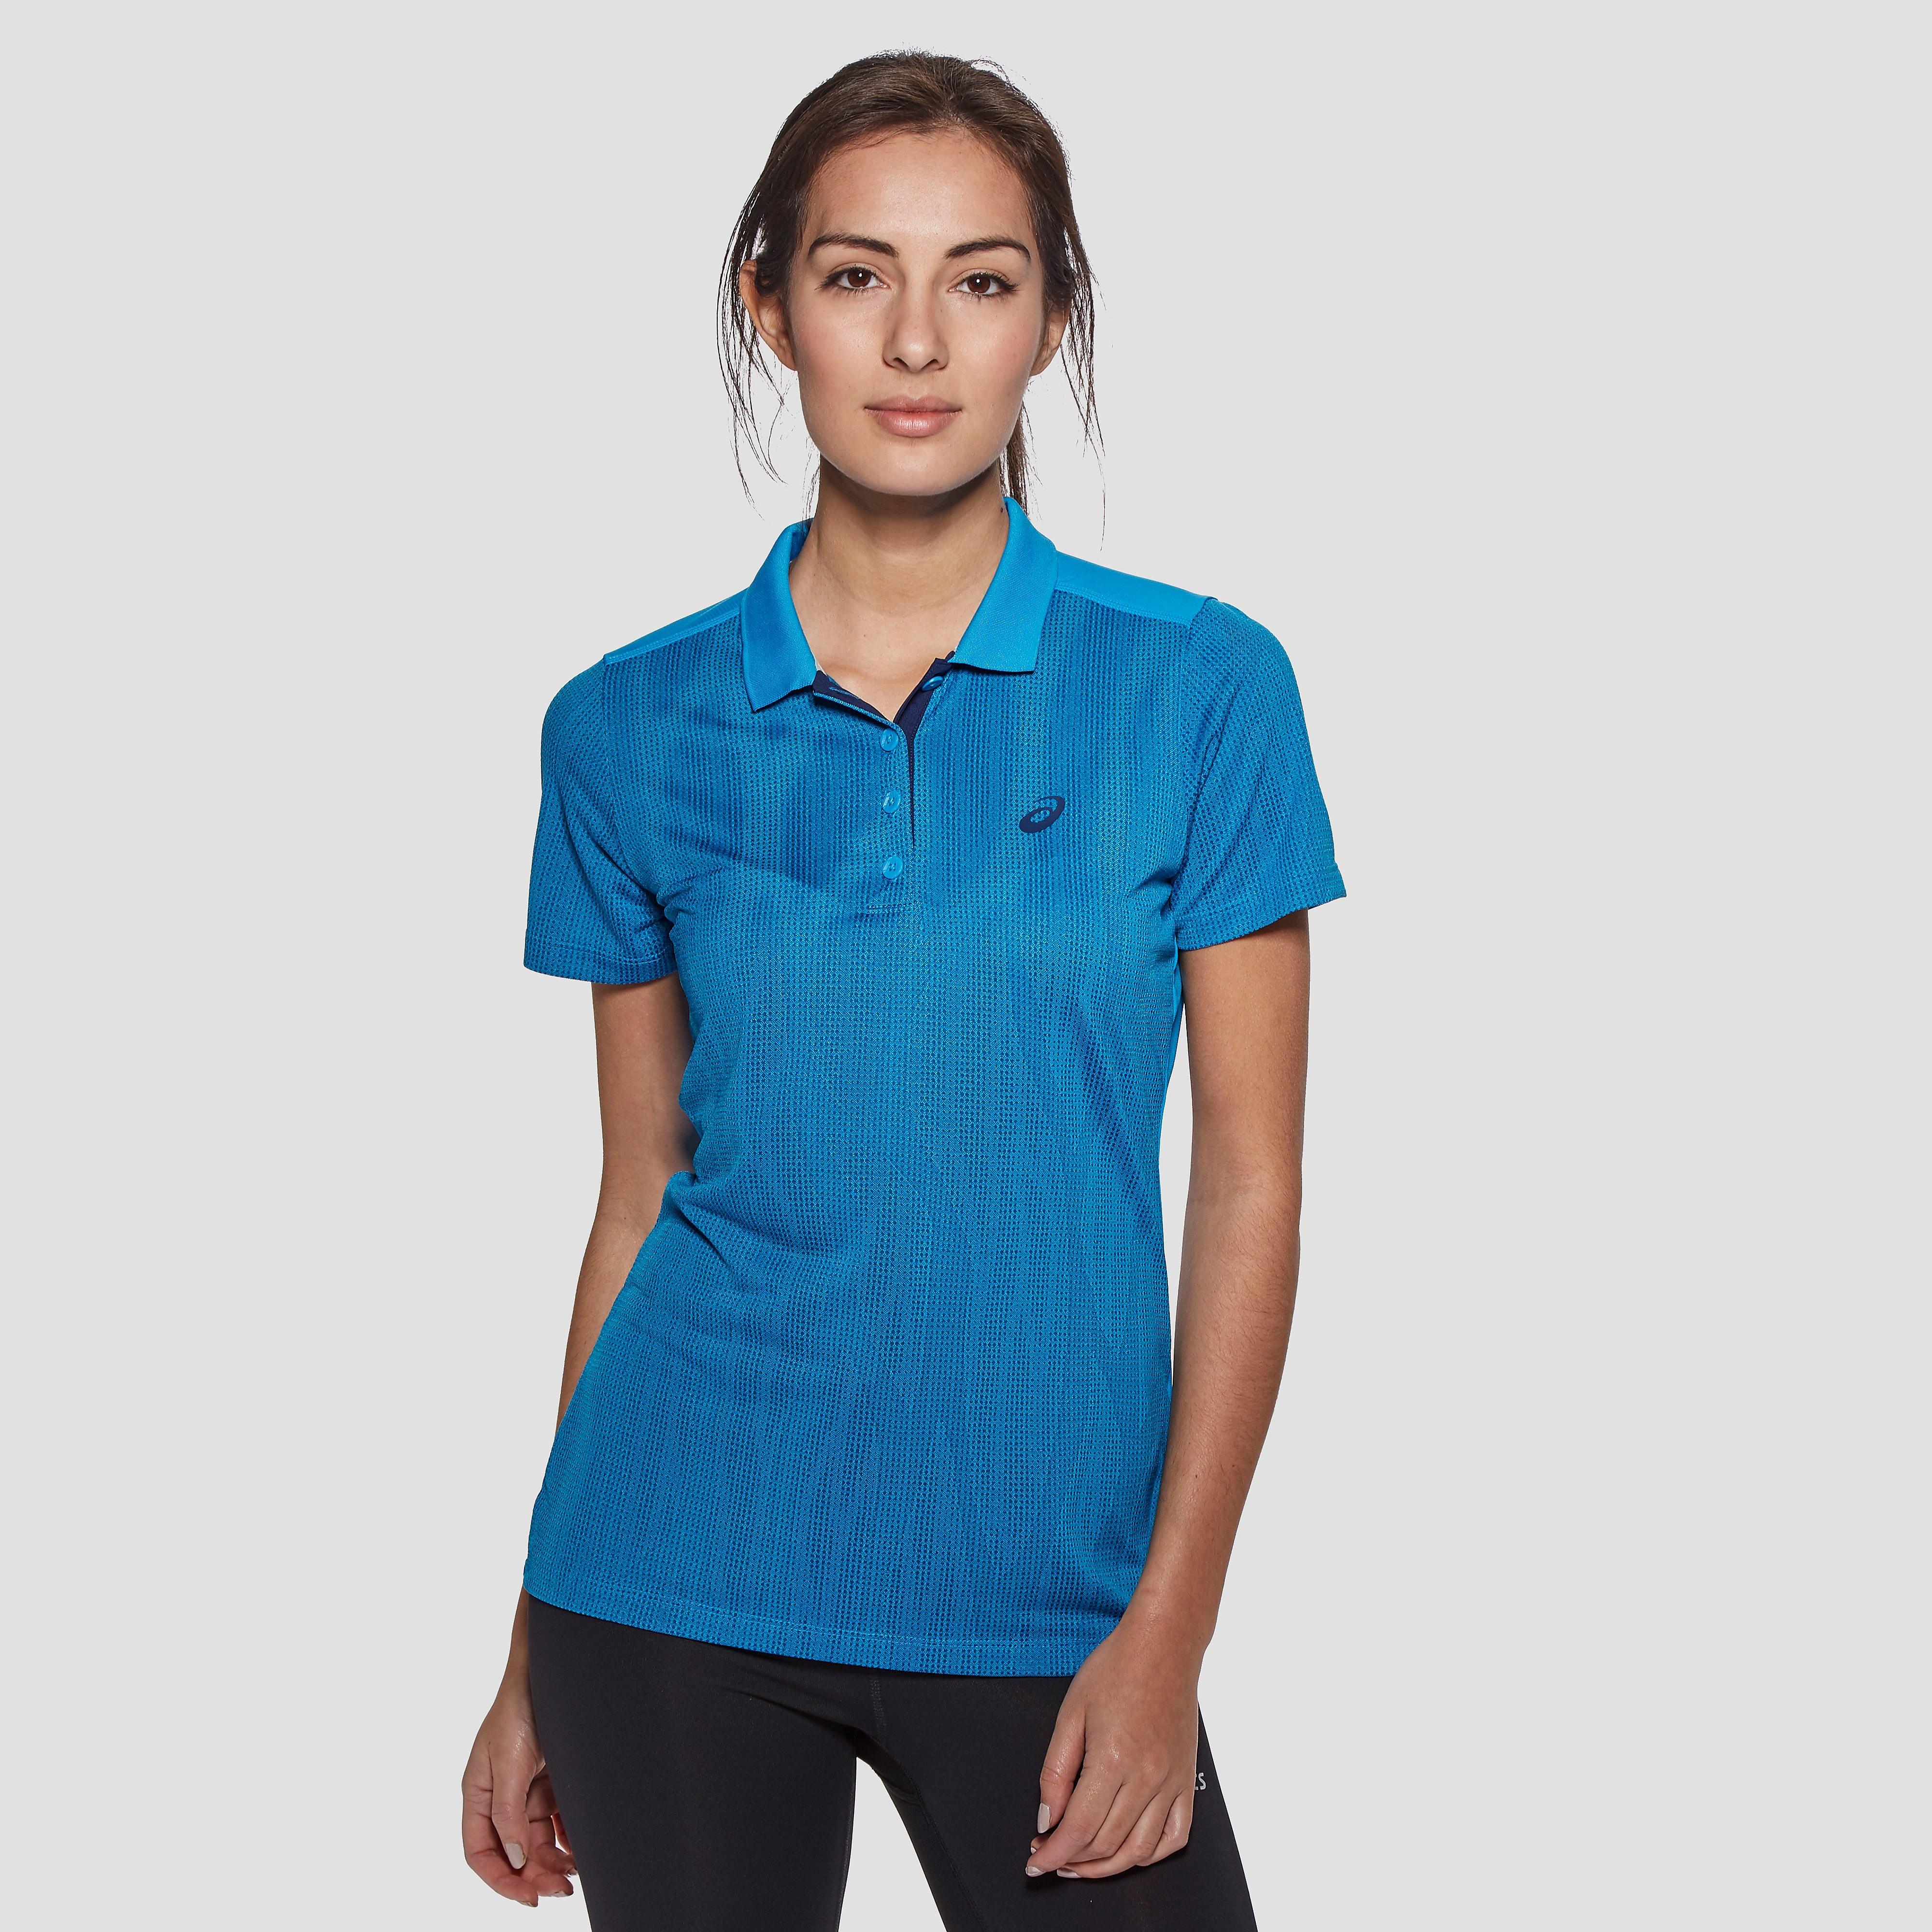 ASICS Club Short Sleeve Women's Polo